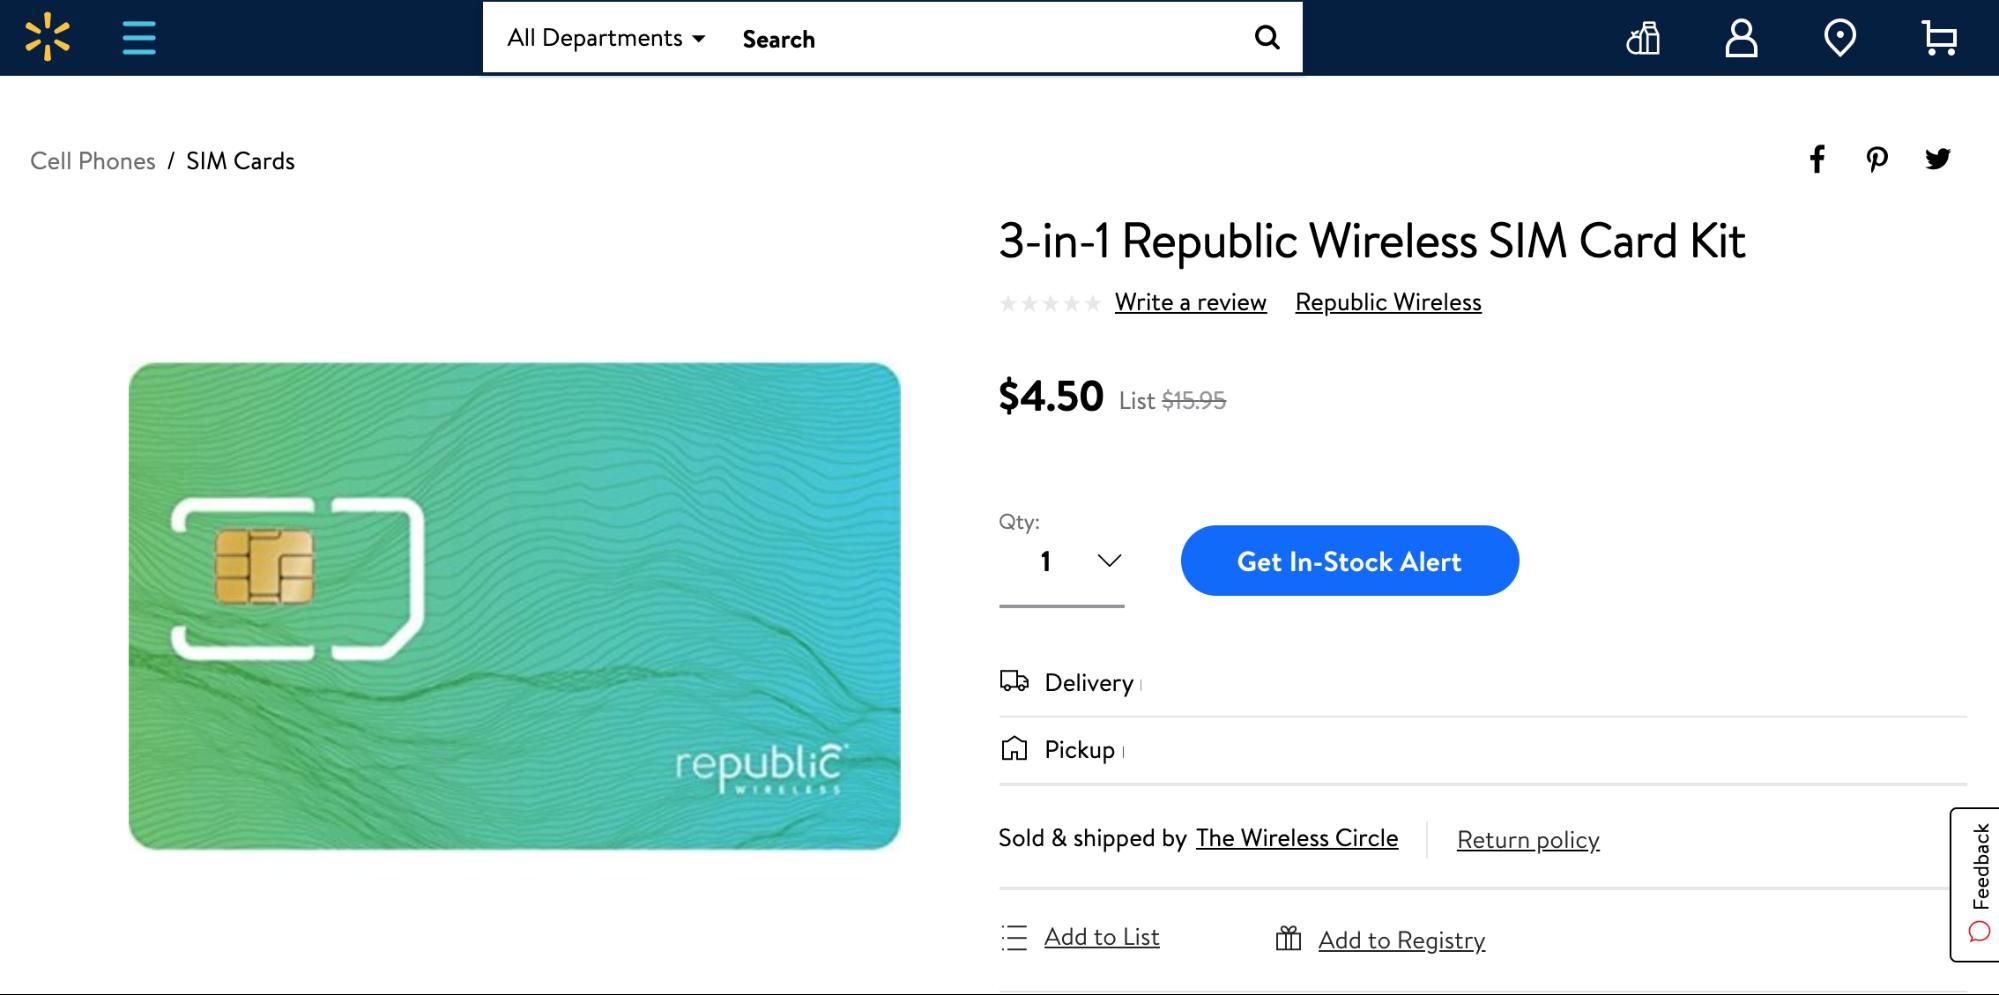 Trickut - Walmart wireless carrier plans - republic wireless sim card kit